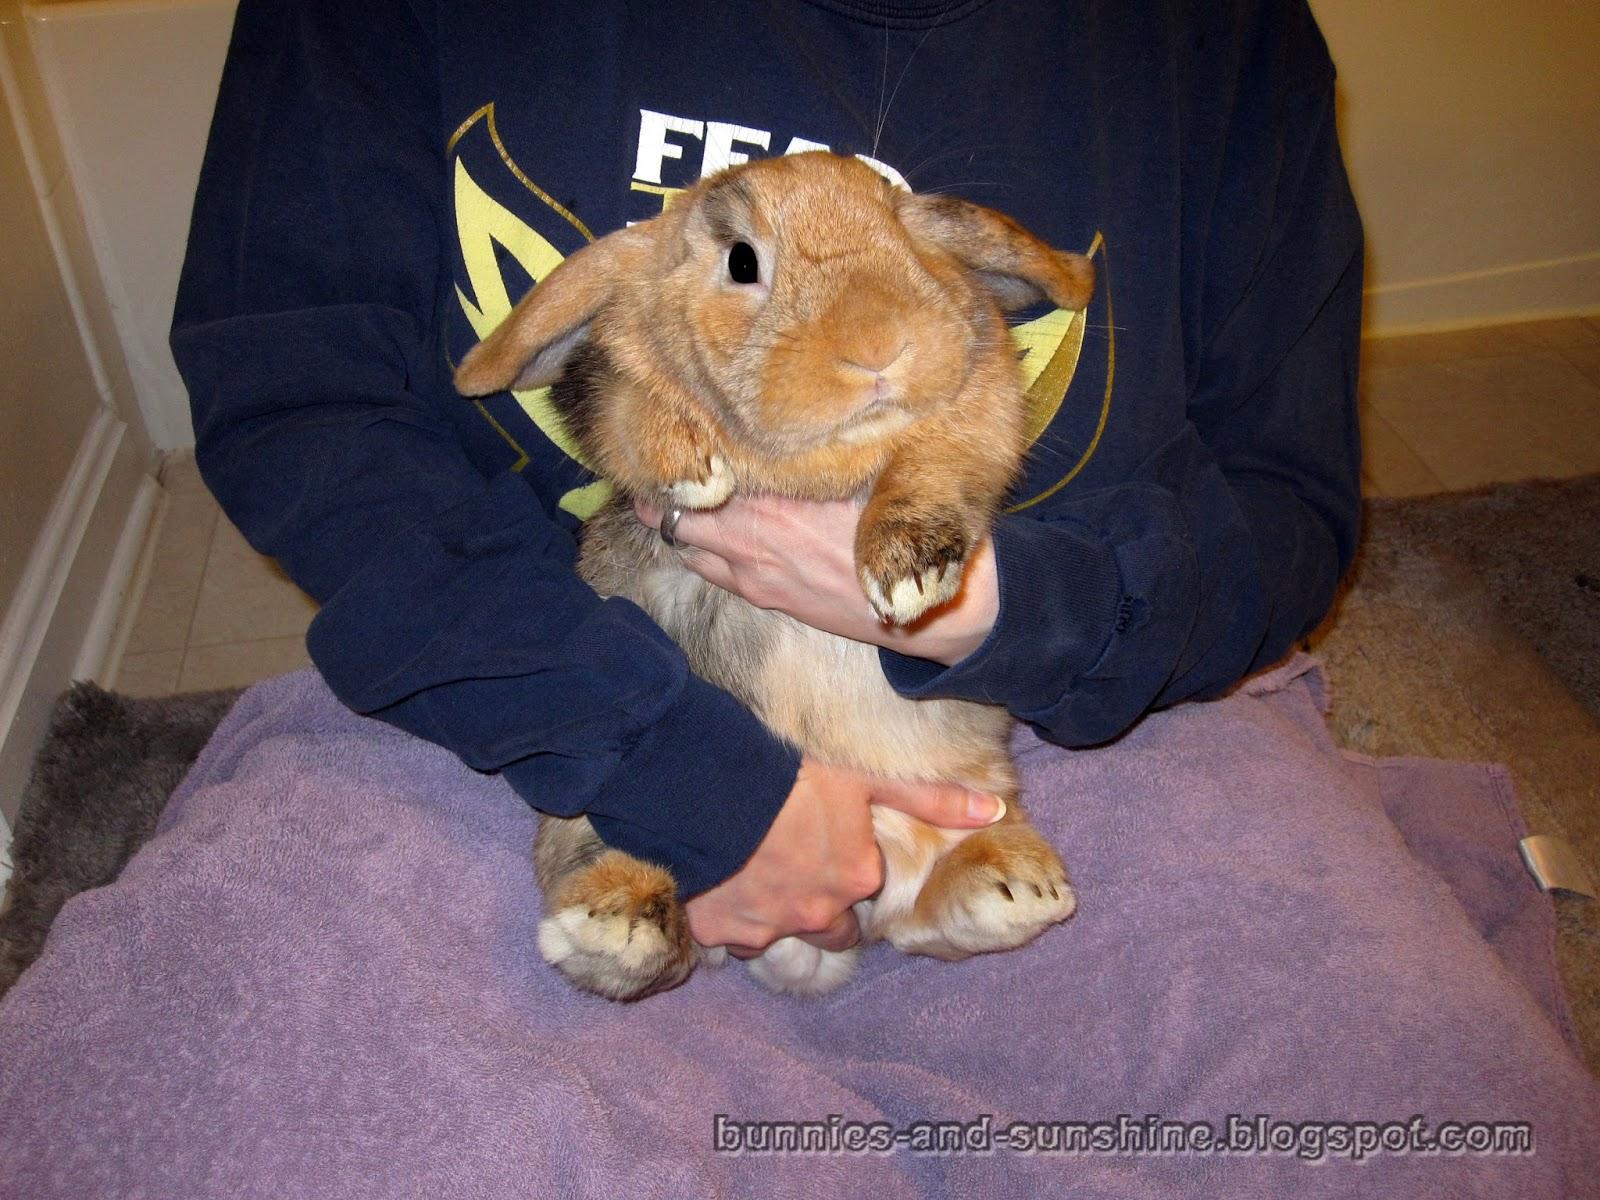 Bunnies and Sunshine: Bunny mani-pedi time!